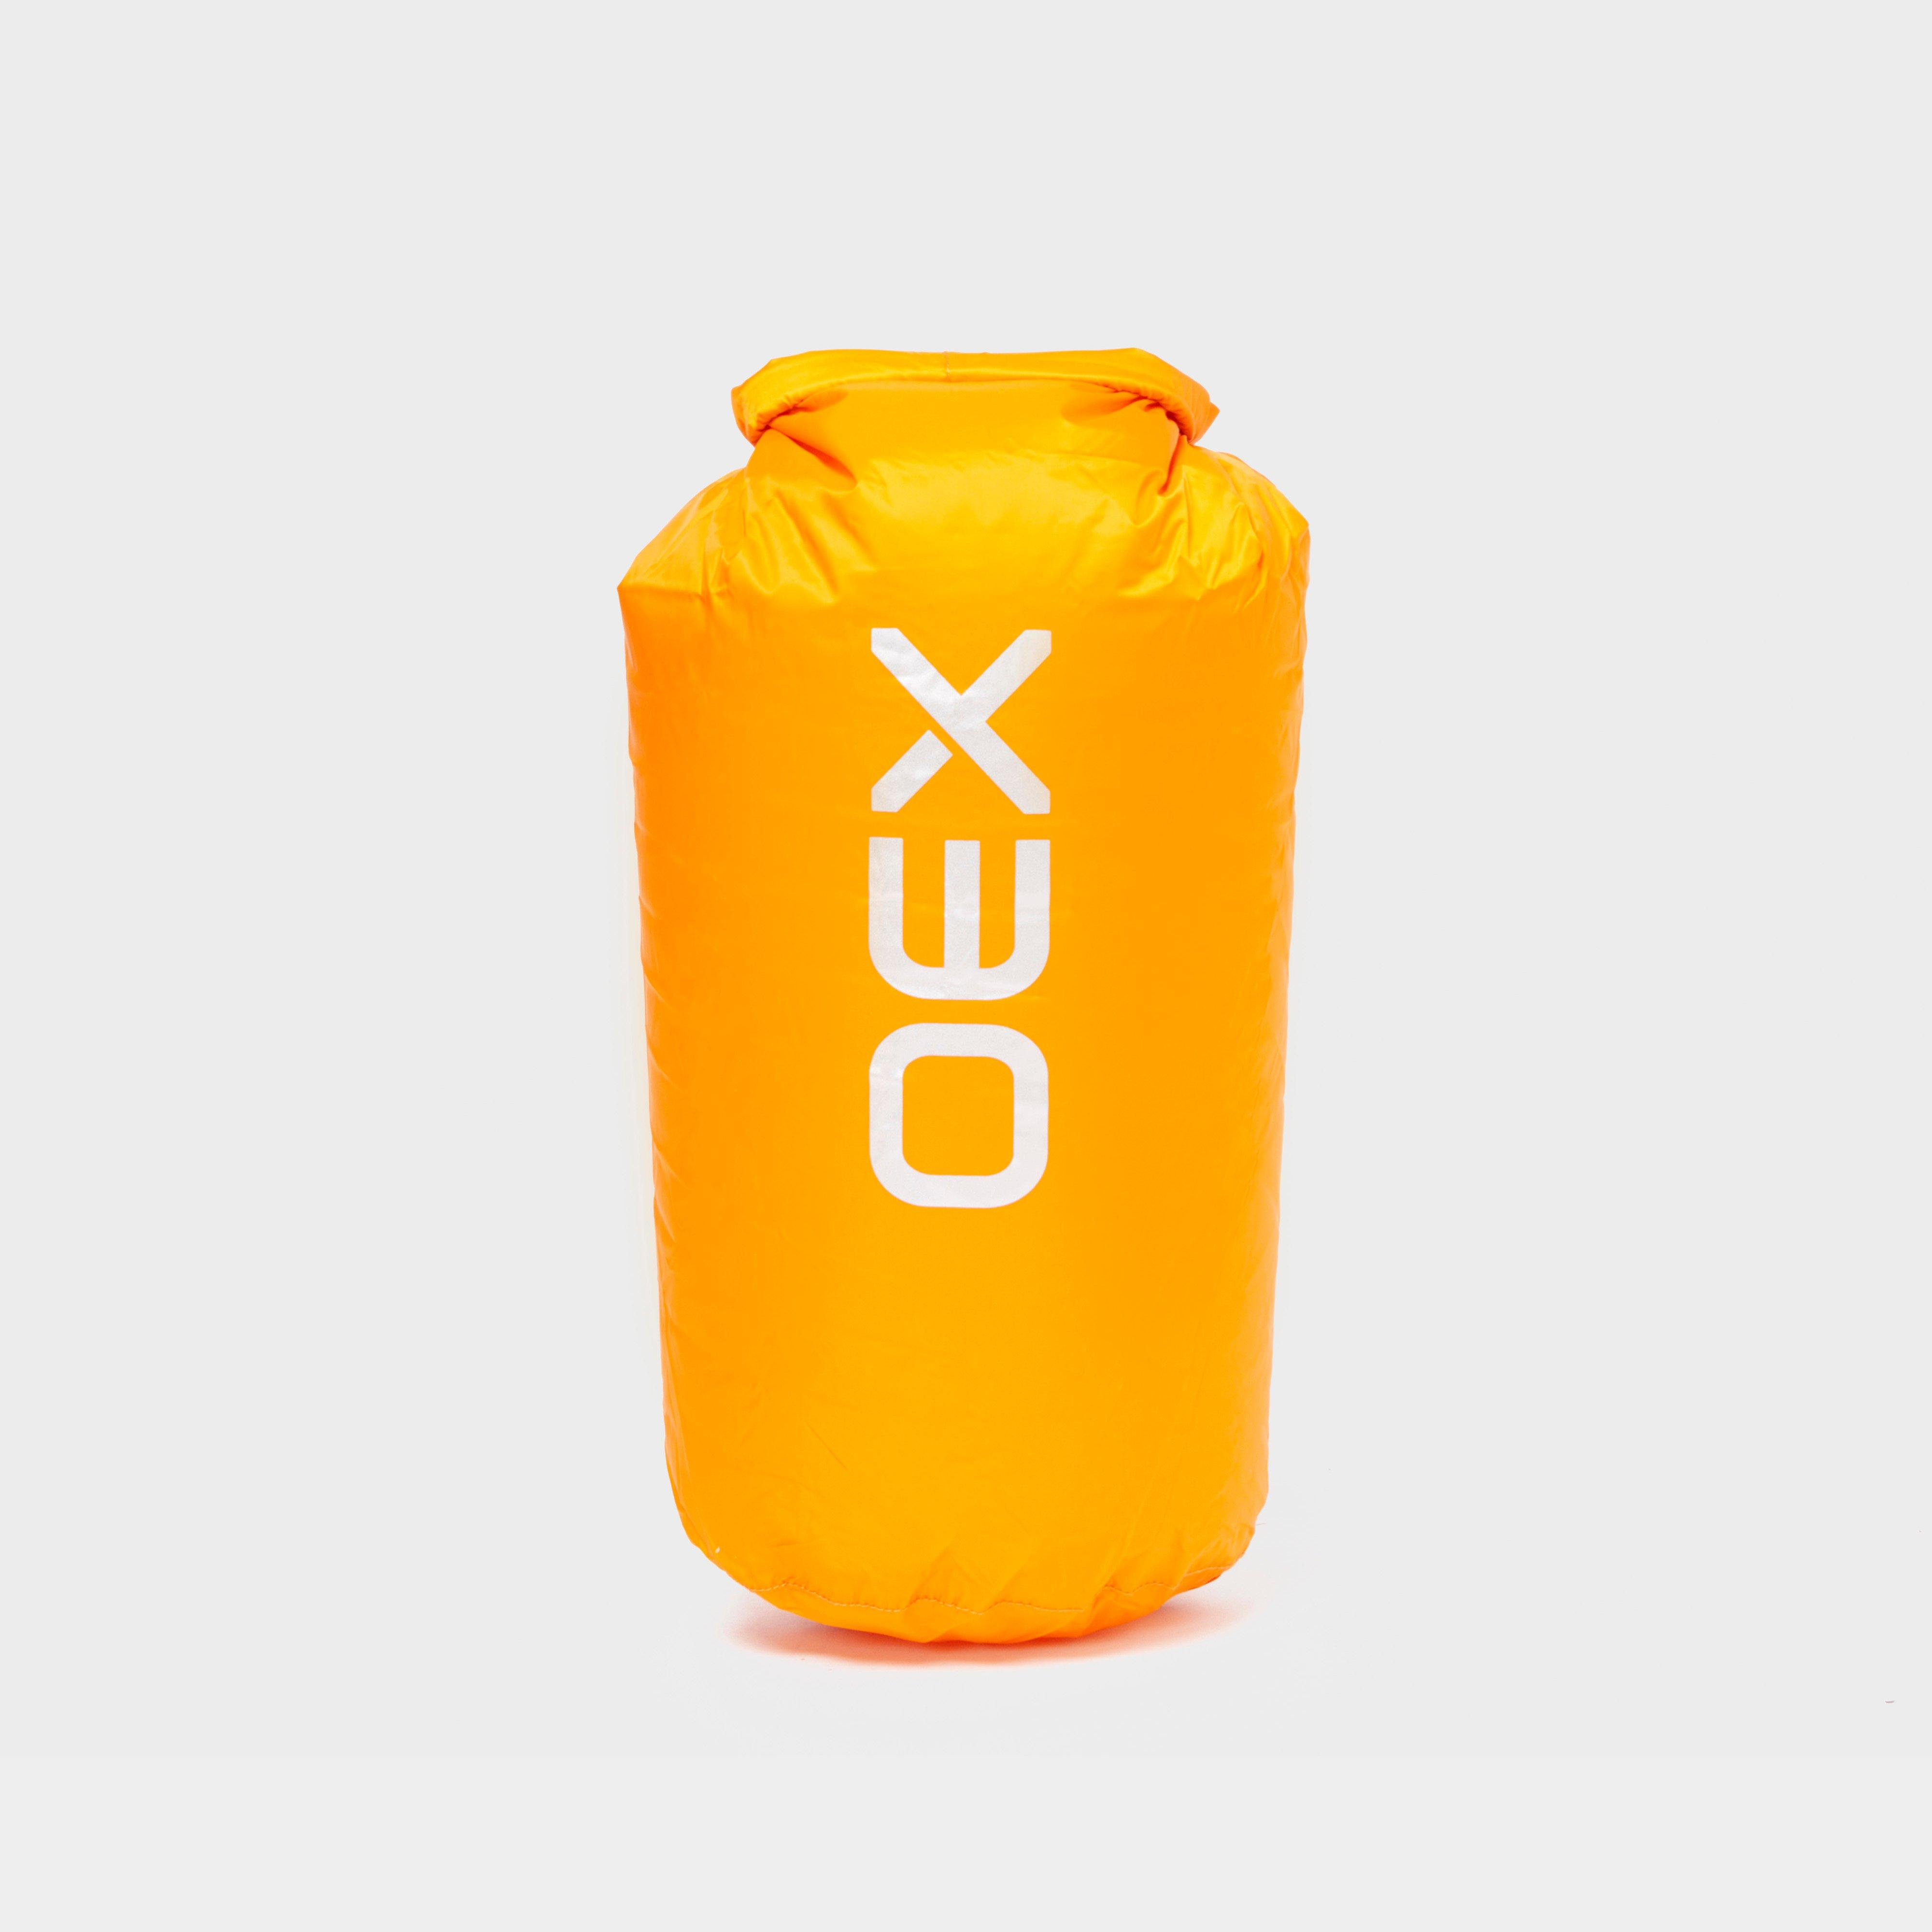 Image of Oex 15 Litre Drysac - Orange/Org, Orange/ORG